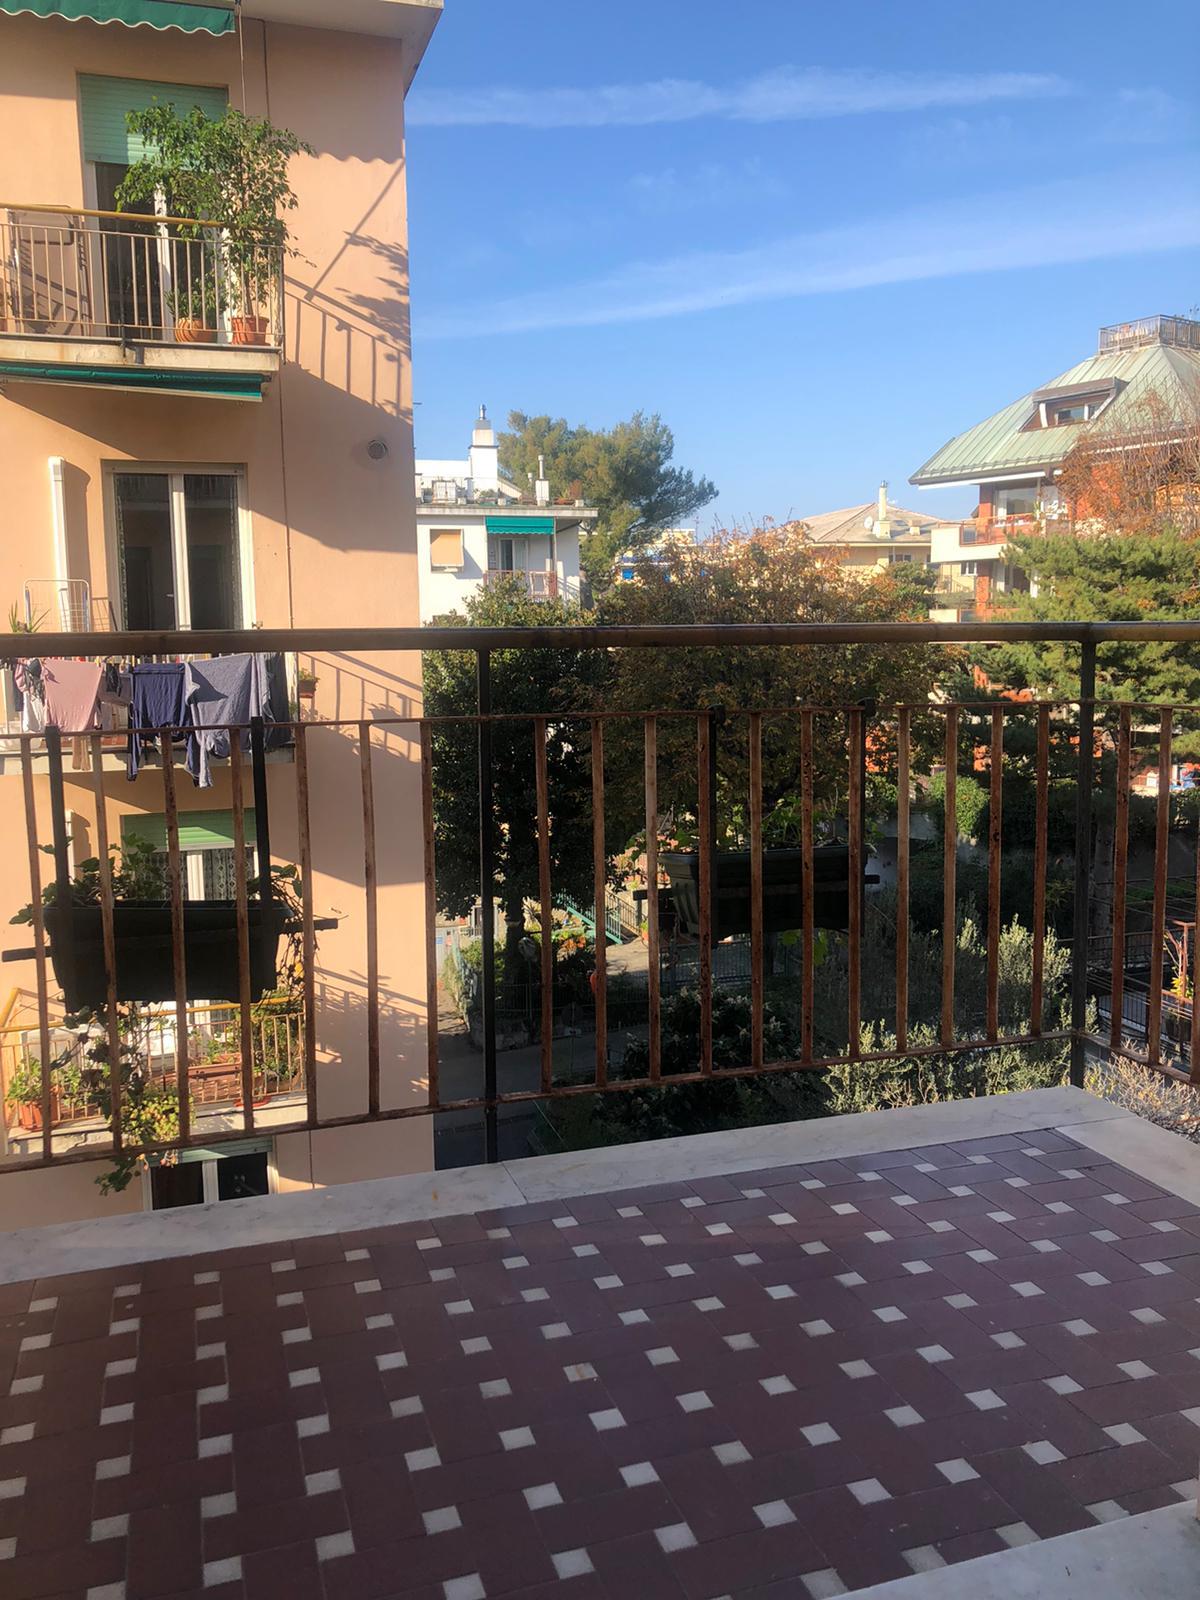 Quarto Via Fabrizi residenziali 5 vani nel verde